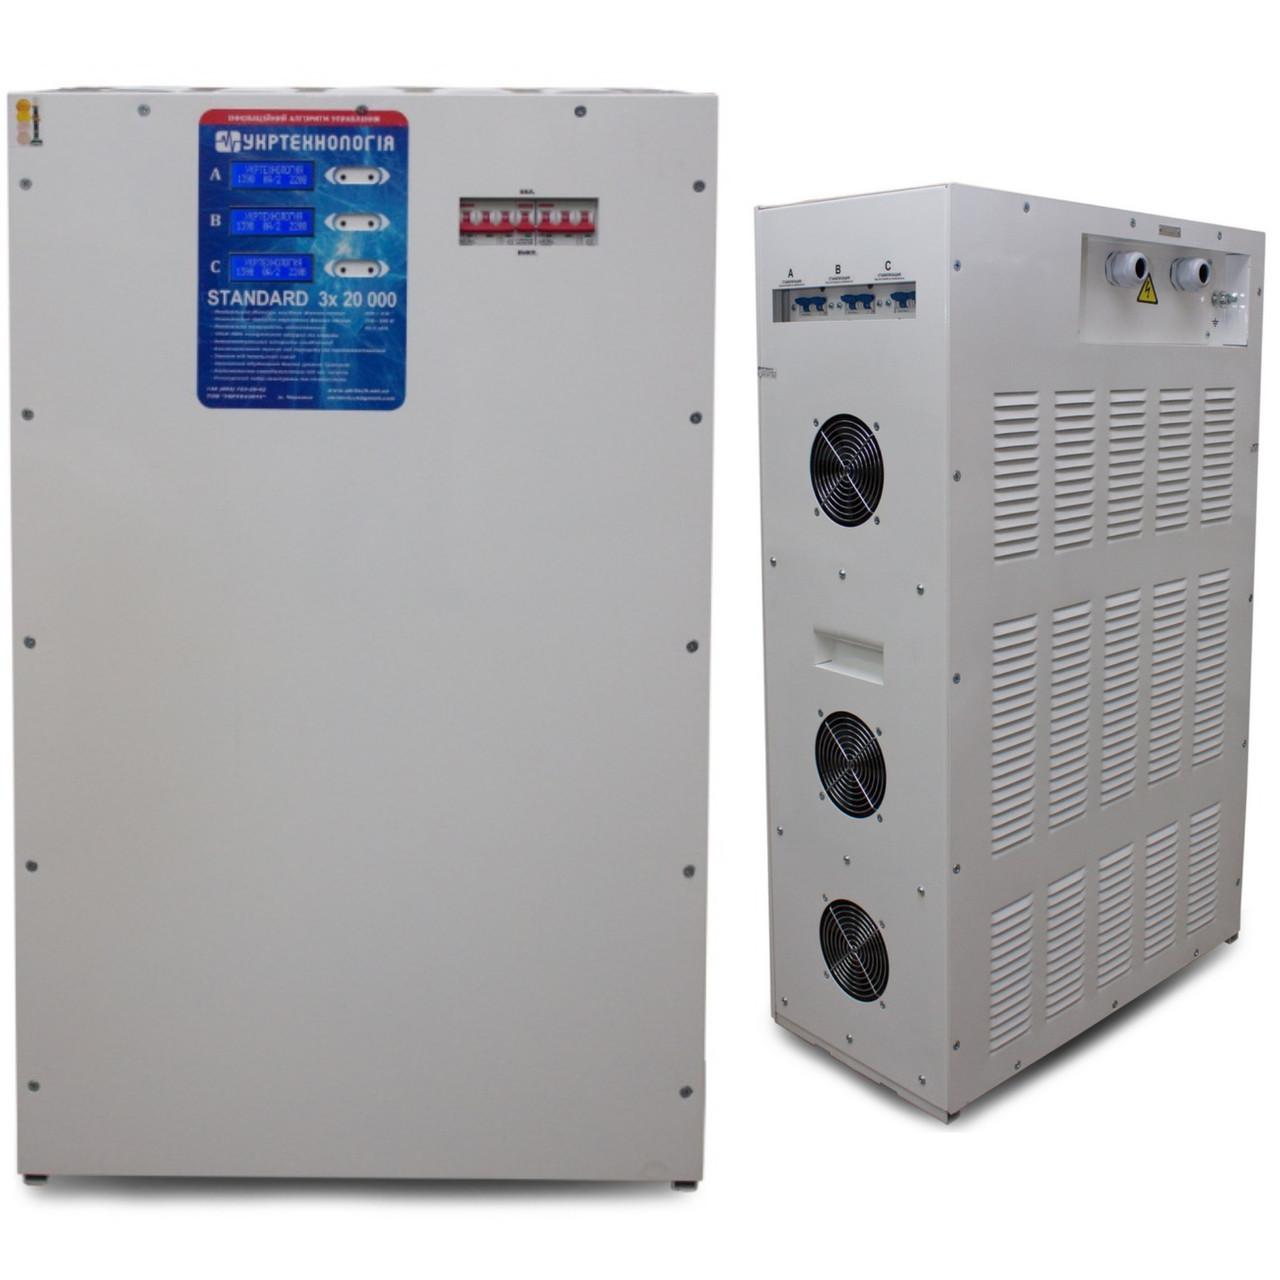 Стабилизатор напряжения Укртехнология HCH 3x7500 Optimum 22,5 кВт